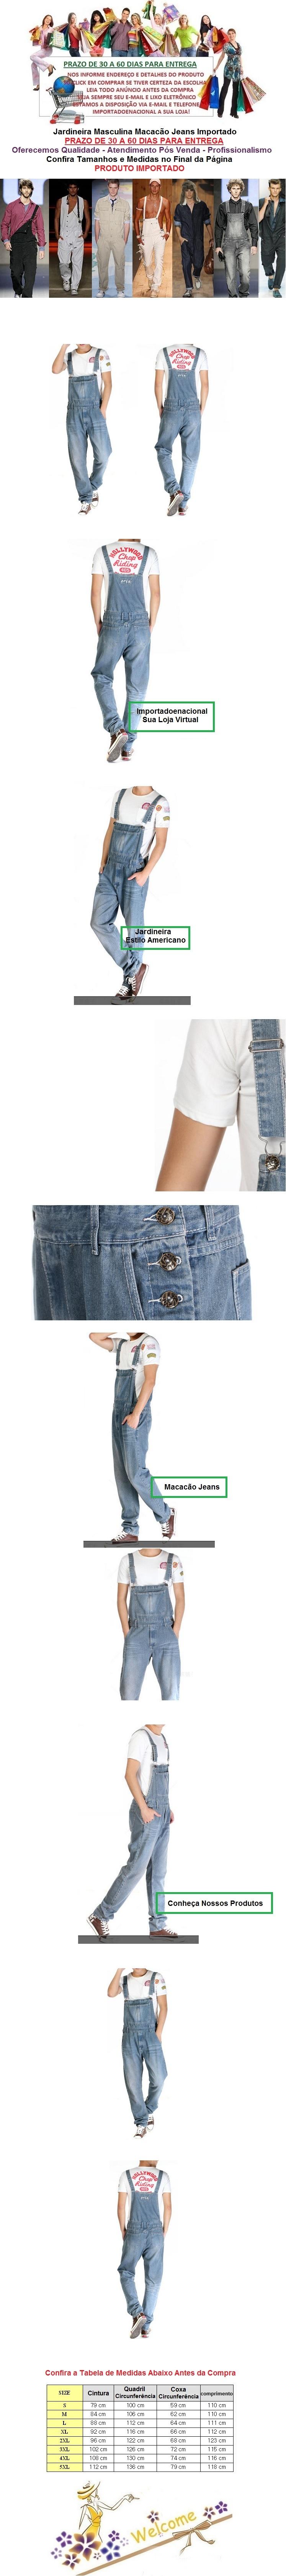 jardineira-masculina-macacao-jeans-importado.jpg